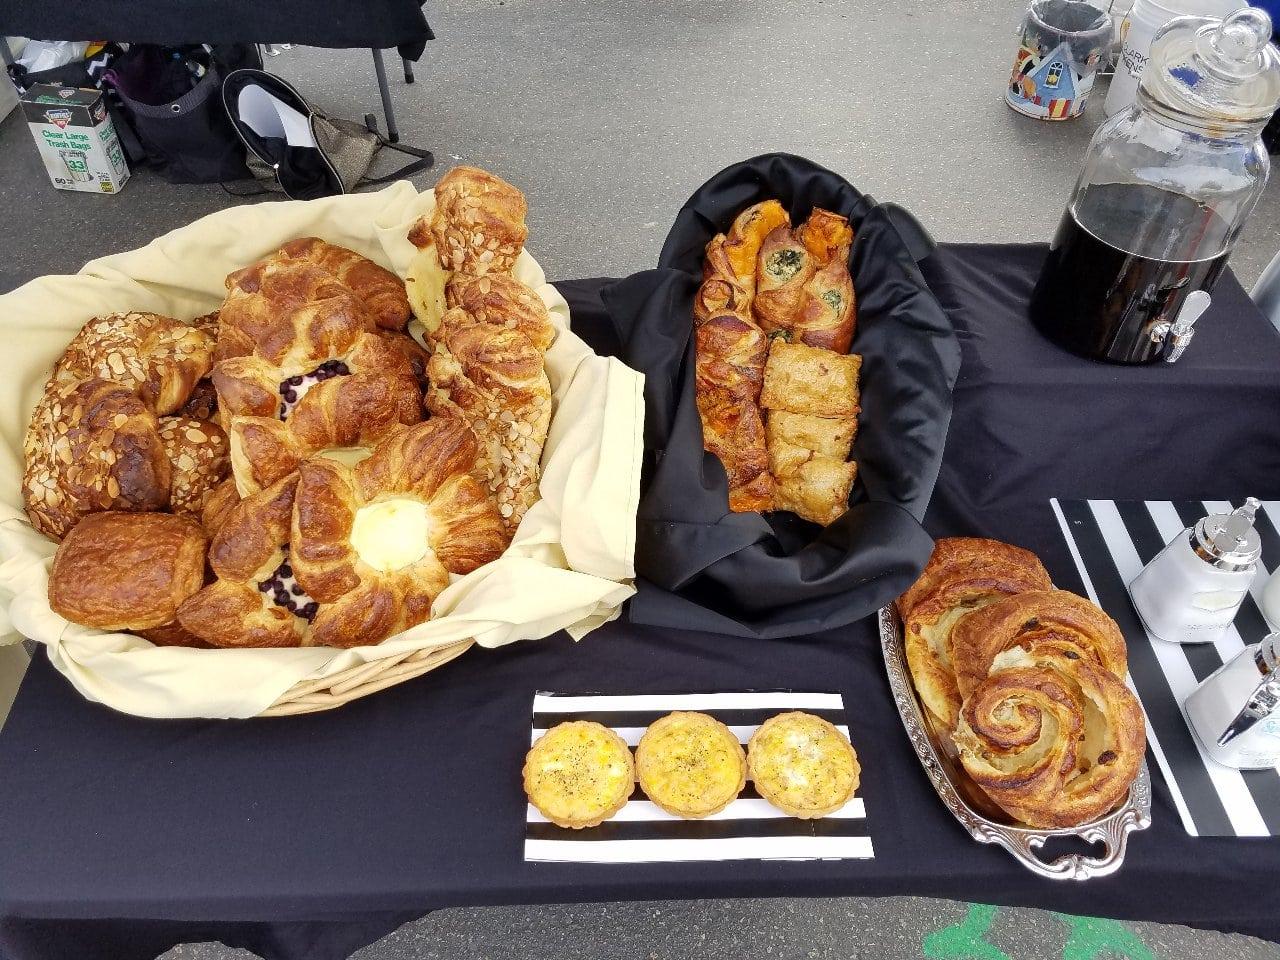 Delicious Breakfast Pastries on a Table by Petite Astorias, Escondido, California